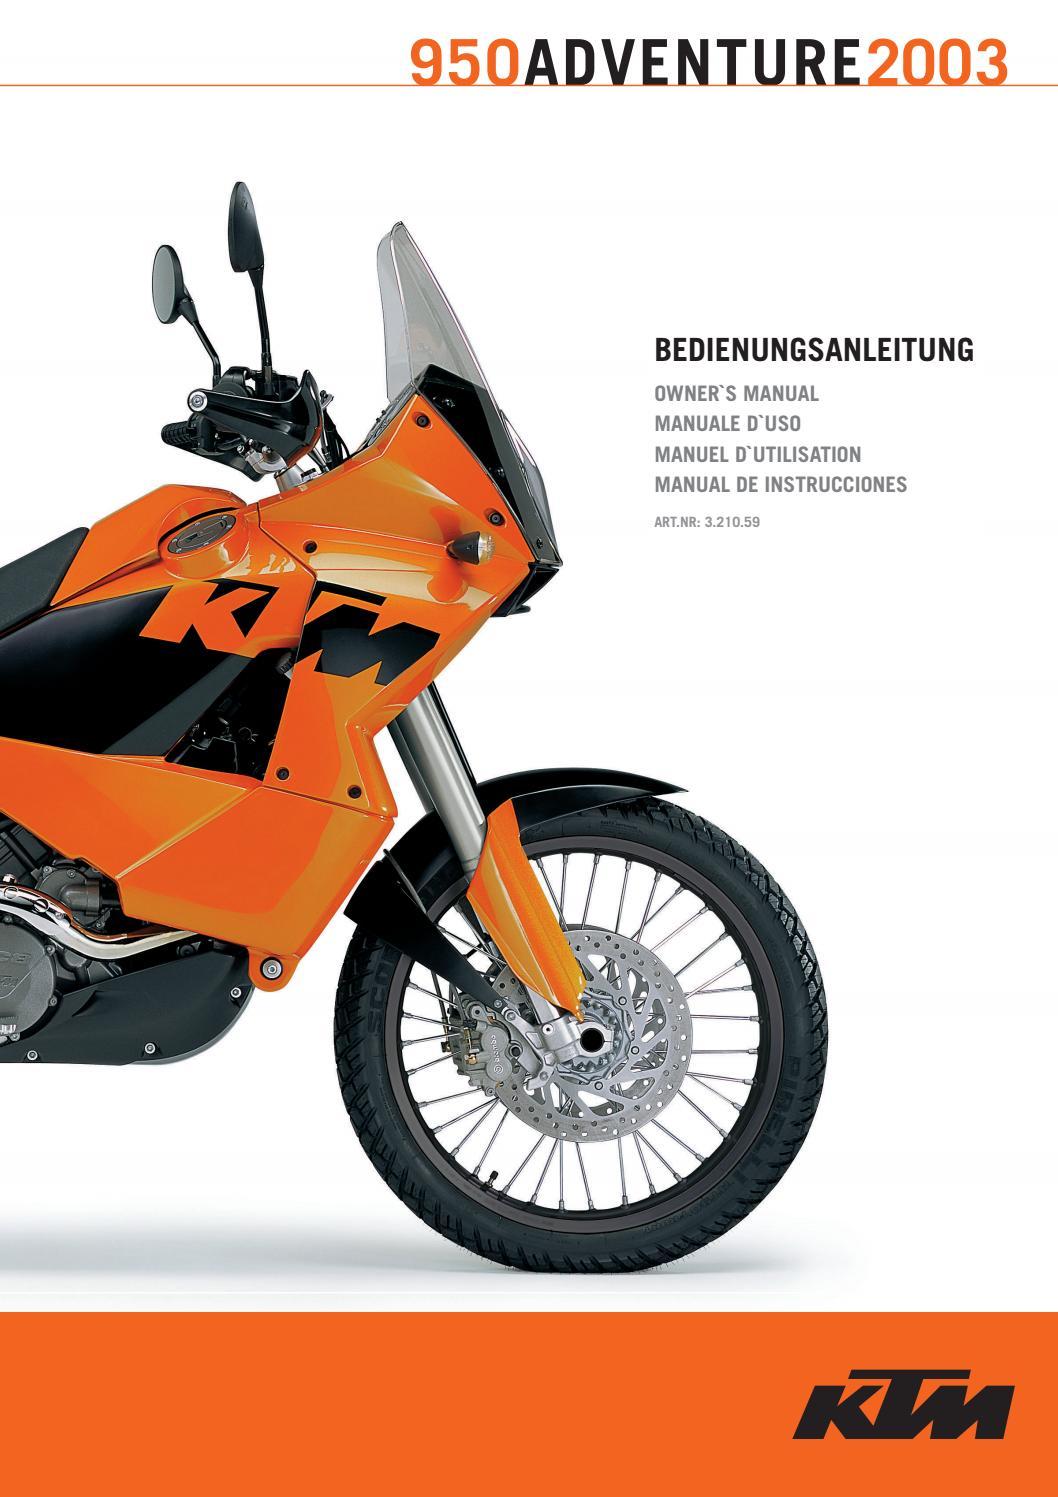 Suspensi/ón De La Motocicleta 8x Trasero Inferior Amortiguador Amortiguador Montaje Del Cojinete-14 Mm